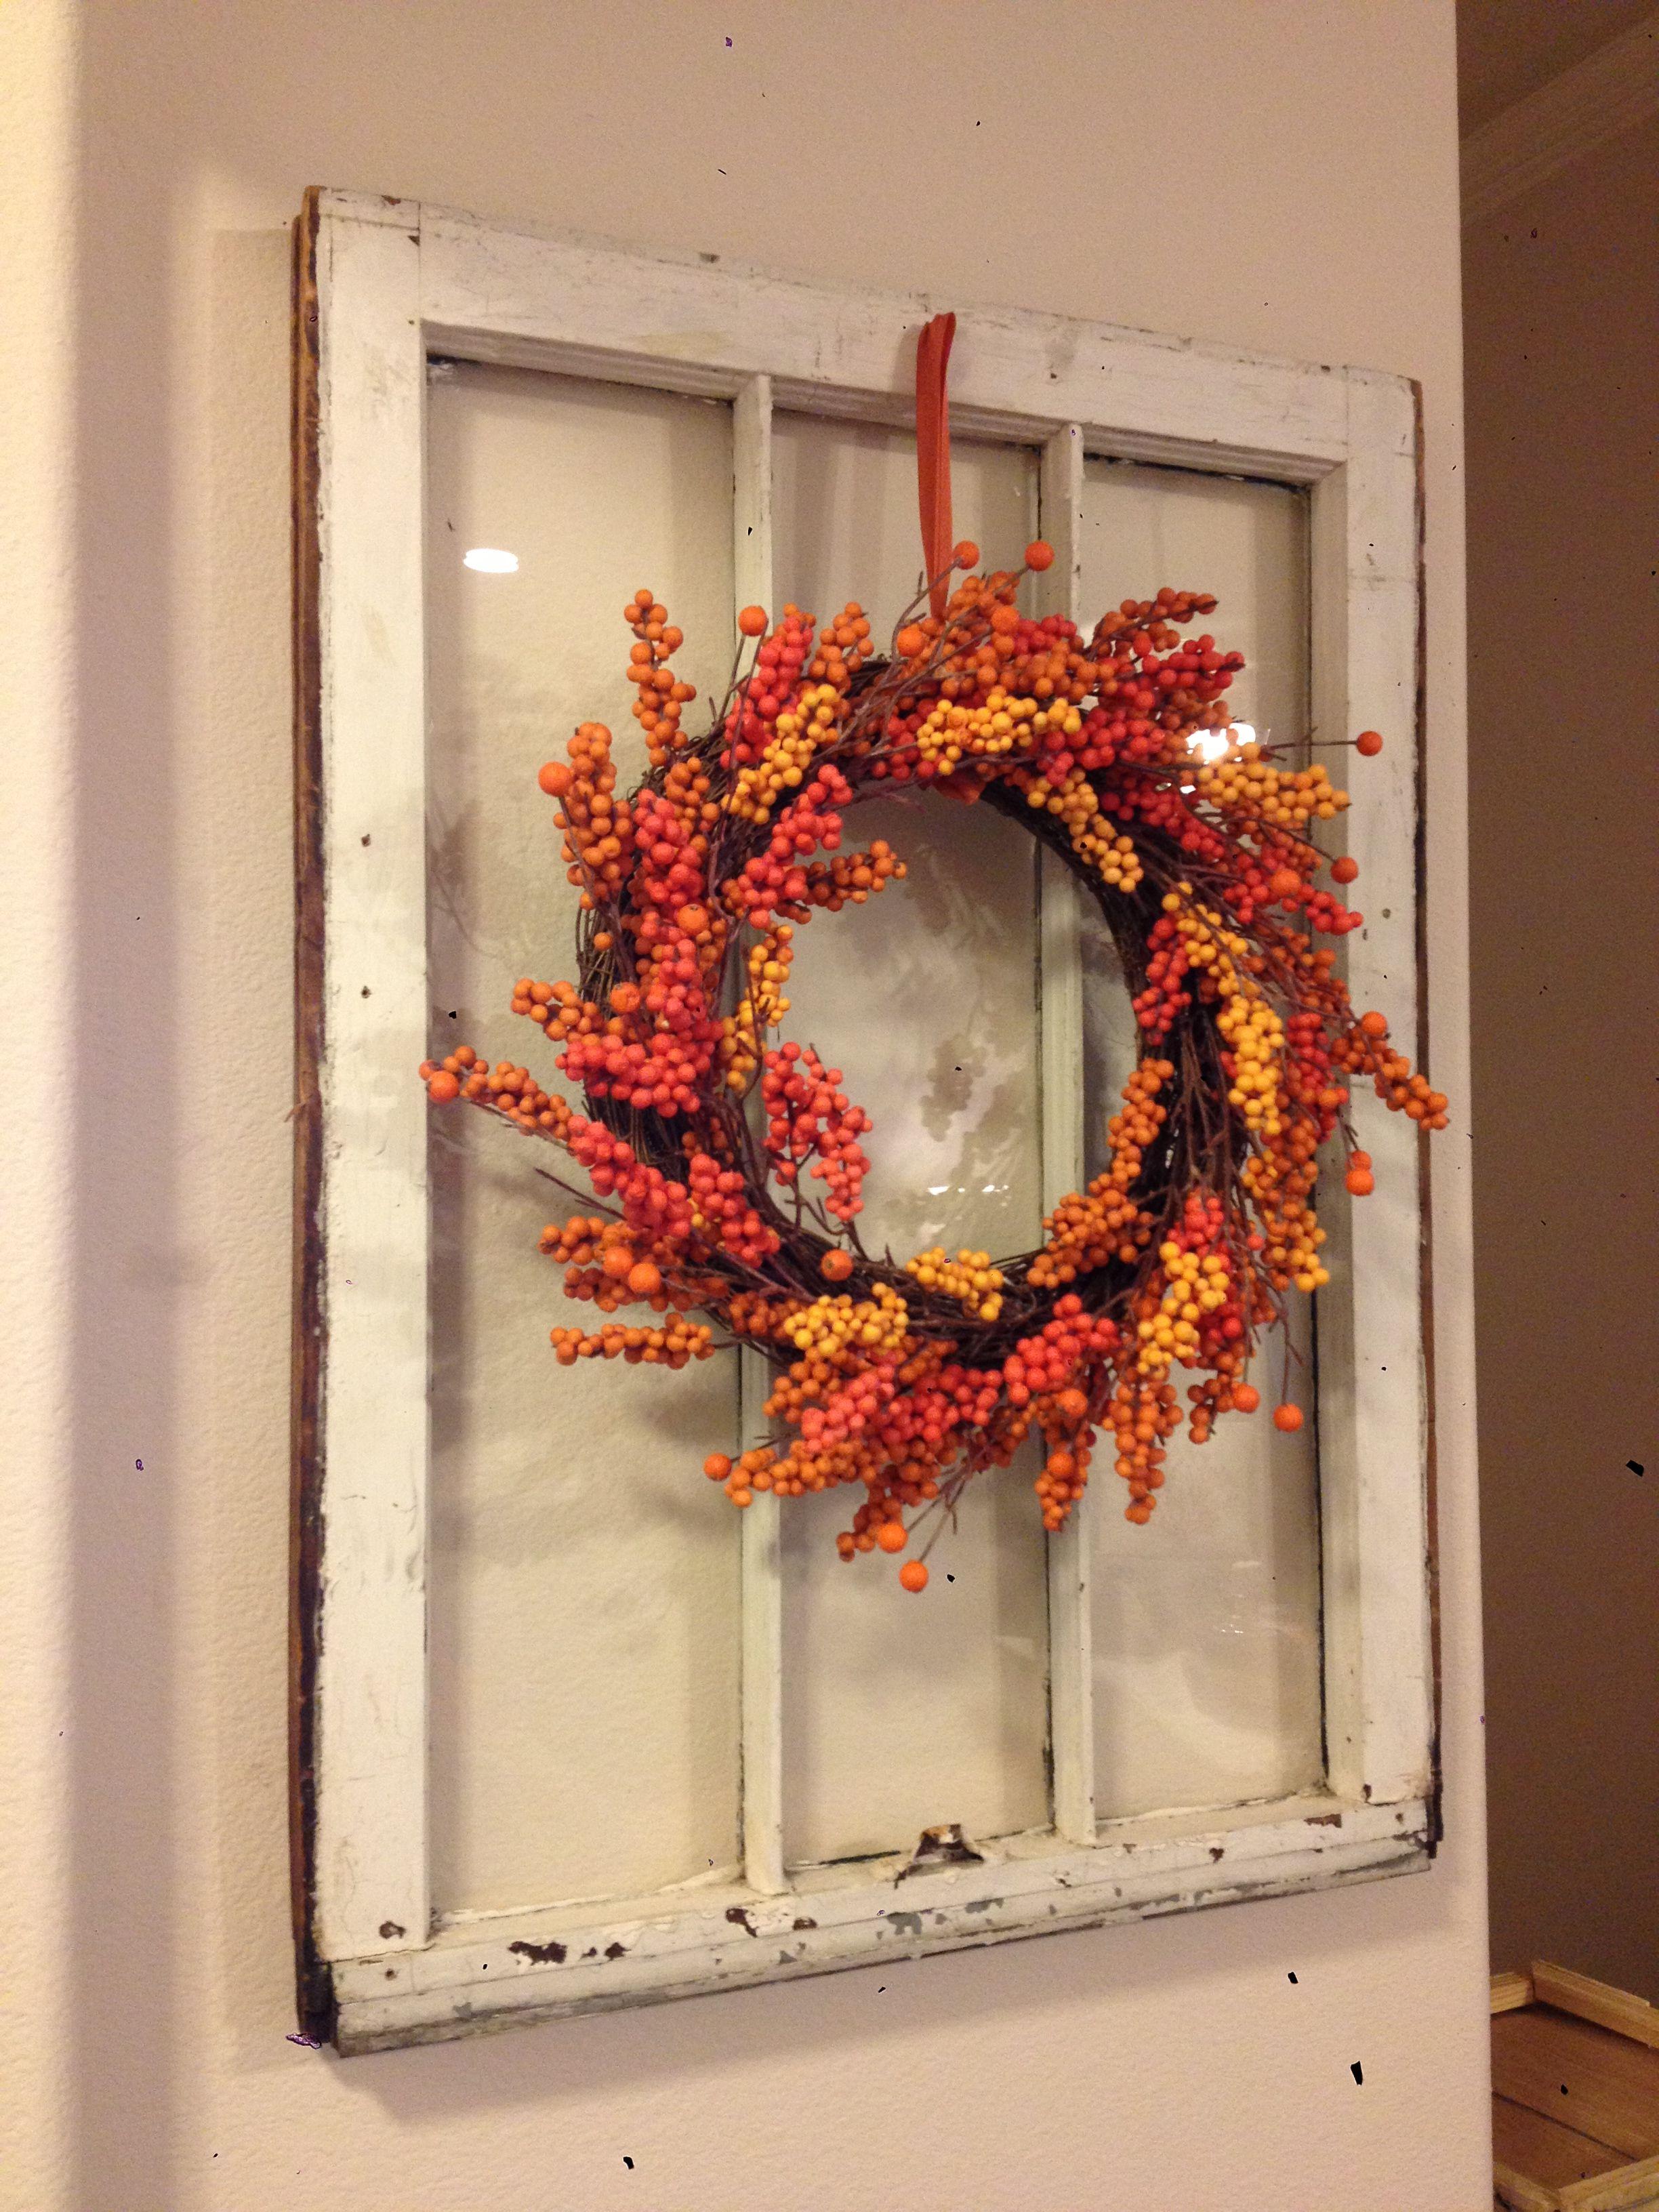 Window frame decor with wreath  wreath in an old window  diy  pinterest  wreaths and window